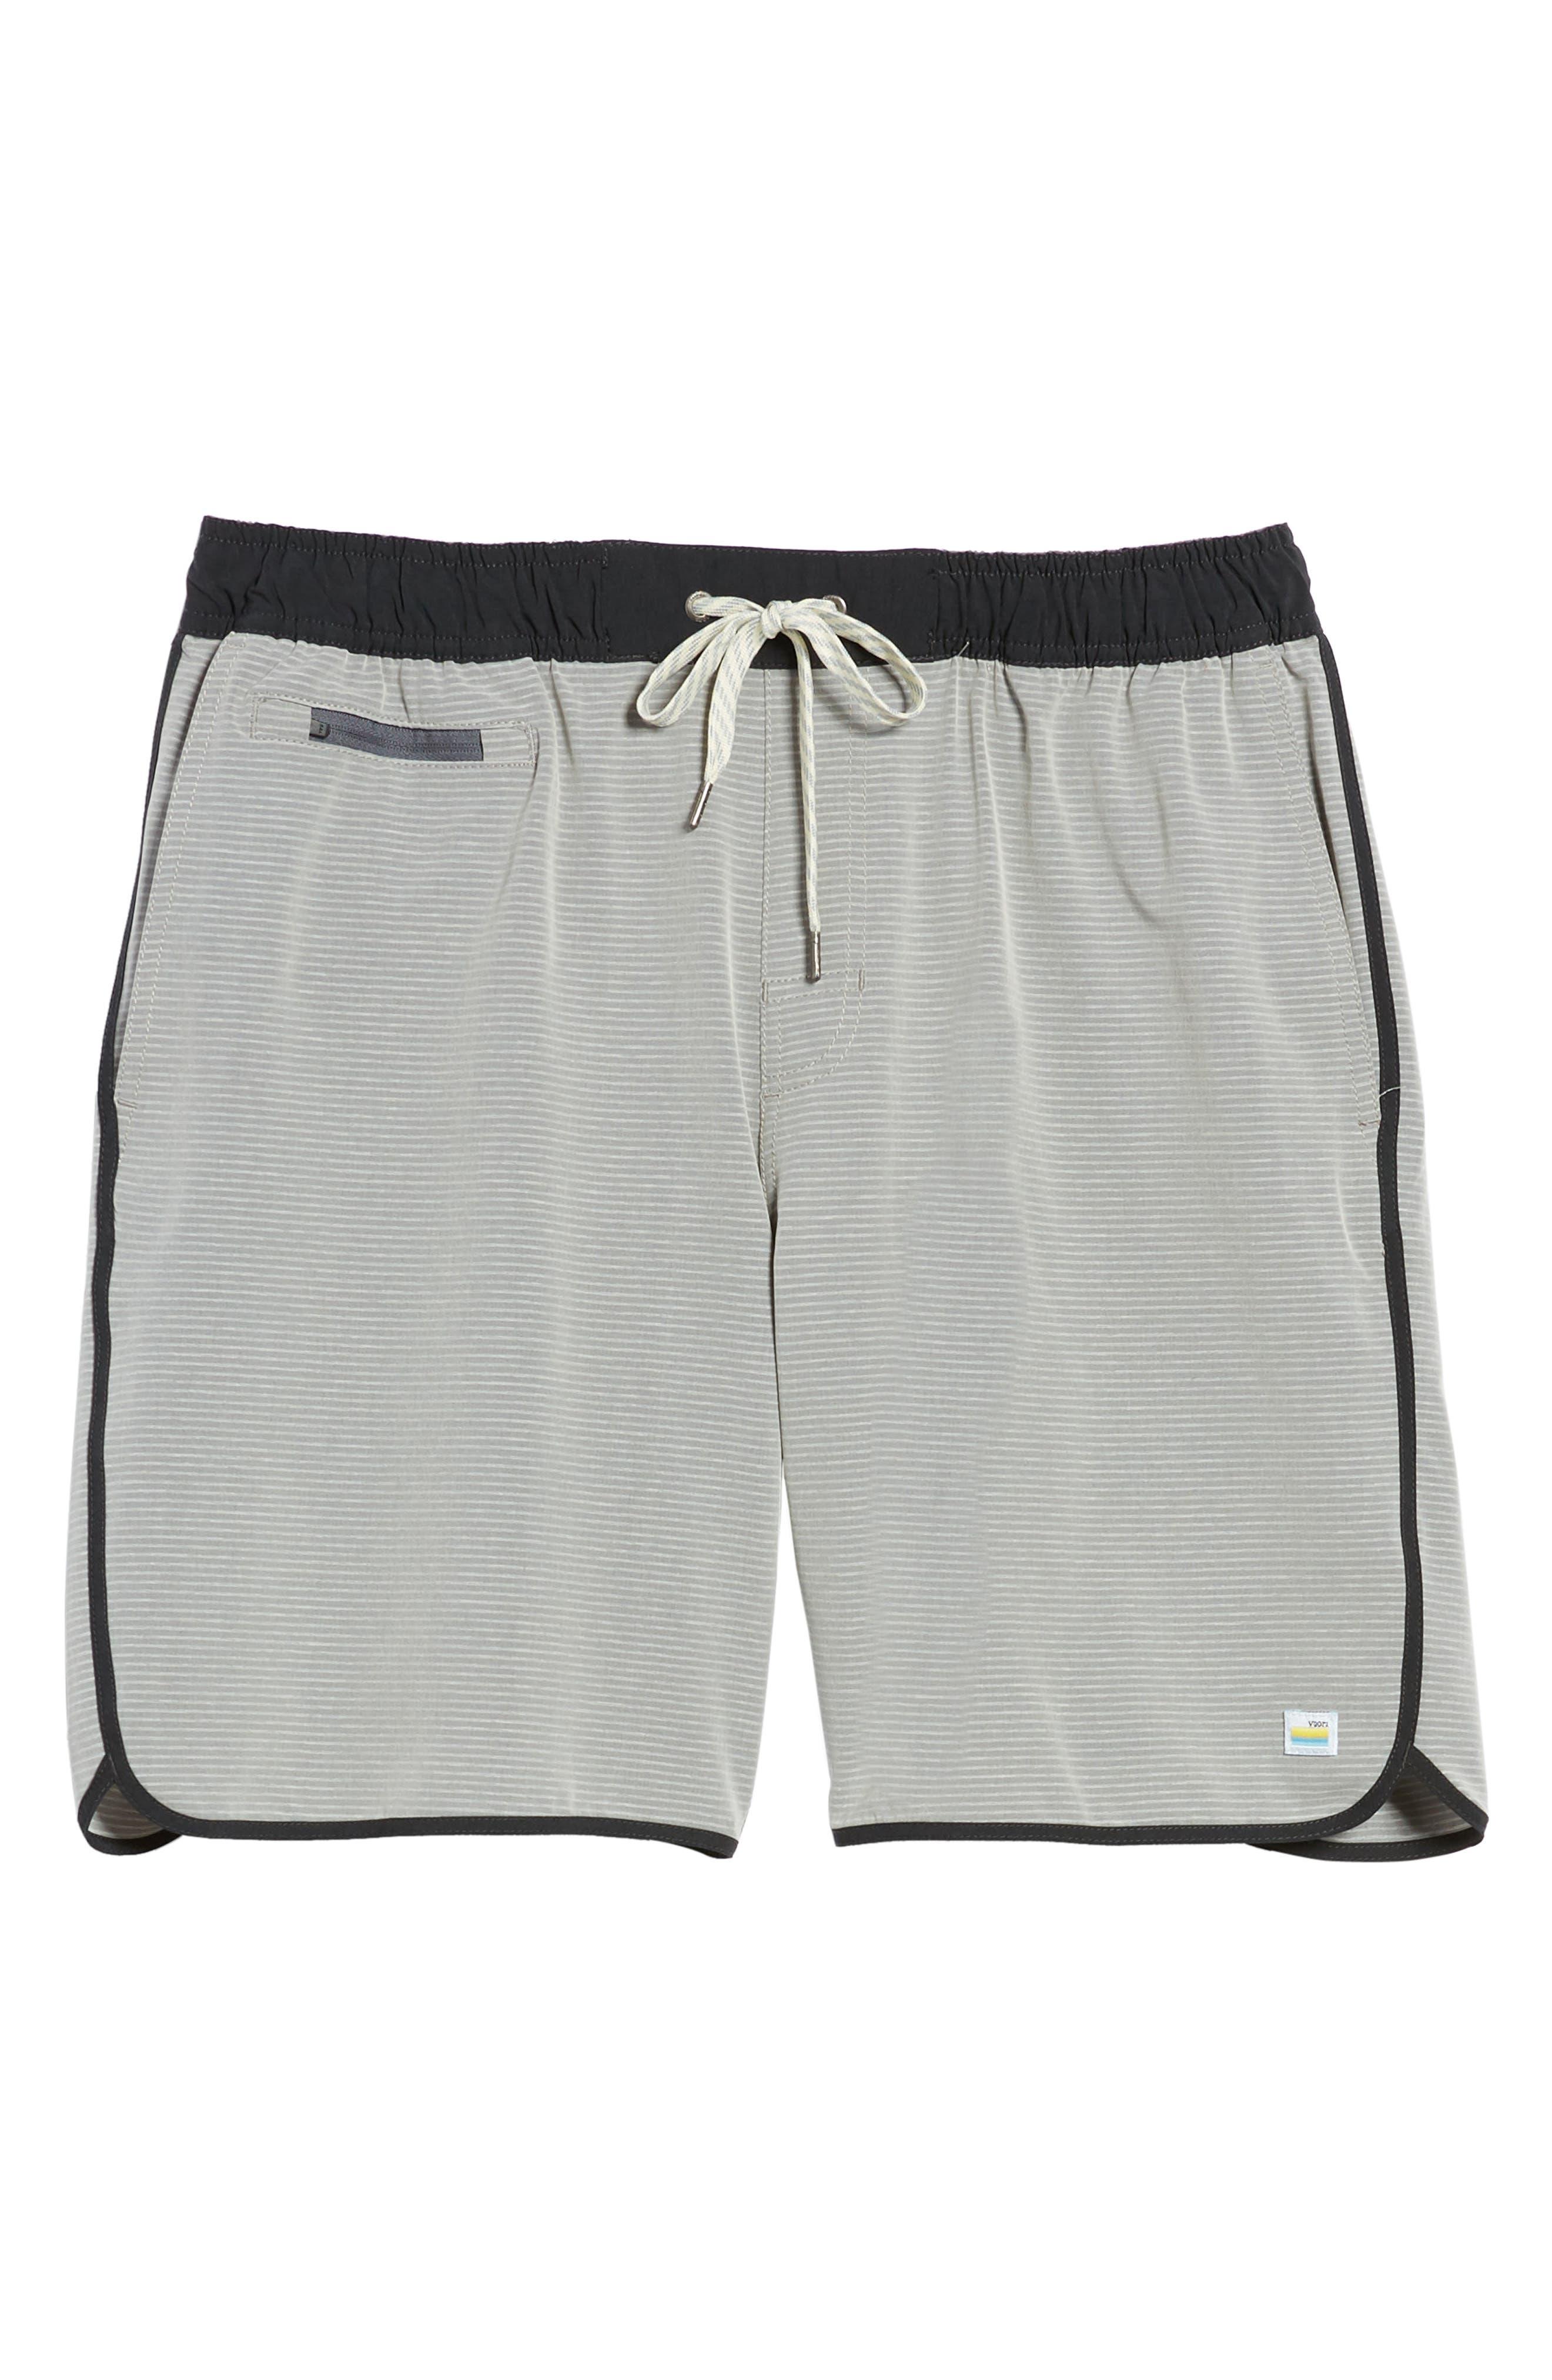 Banks Athletic Shorts,                             Alternate thumbnail 6, color,                             050